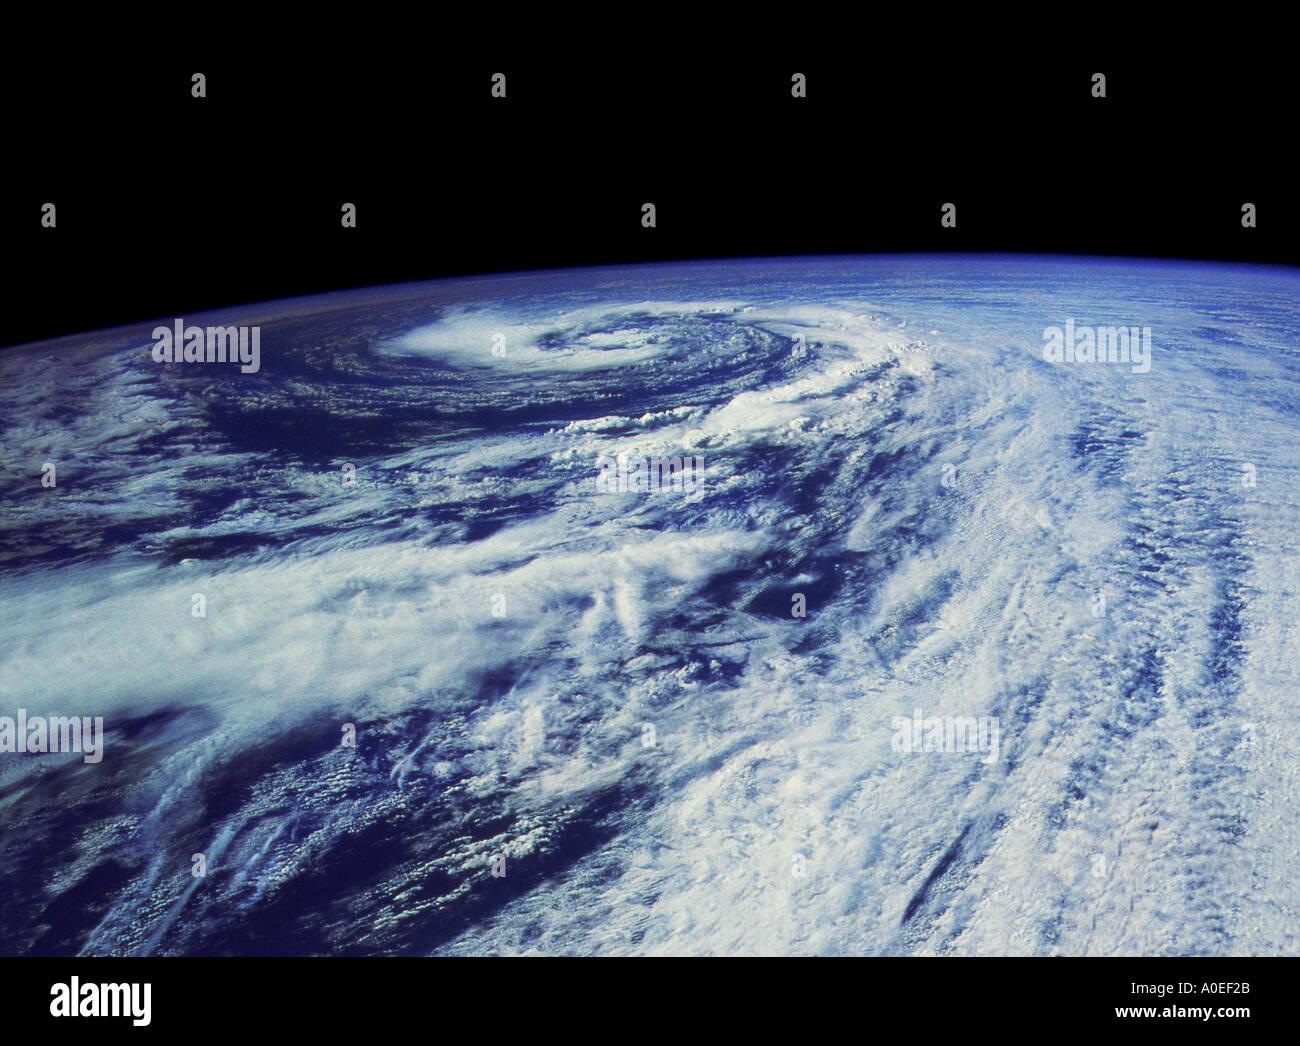 Hurrikan teilgenohmen aus dem Weltraum Stockbild